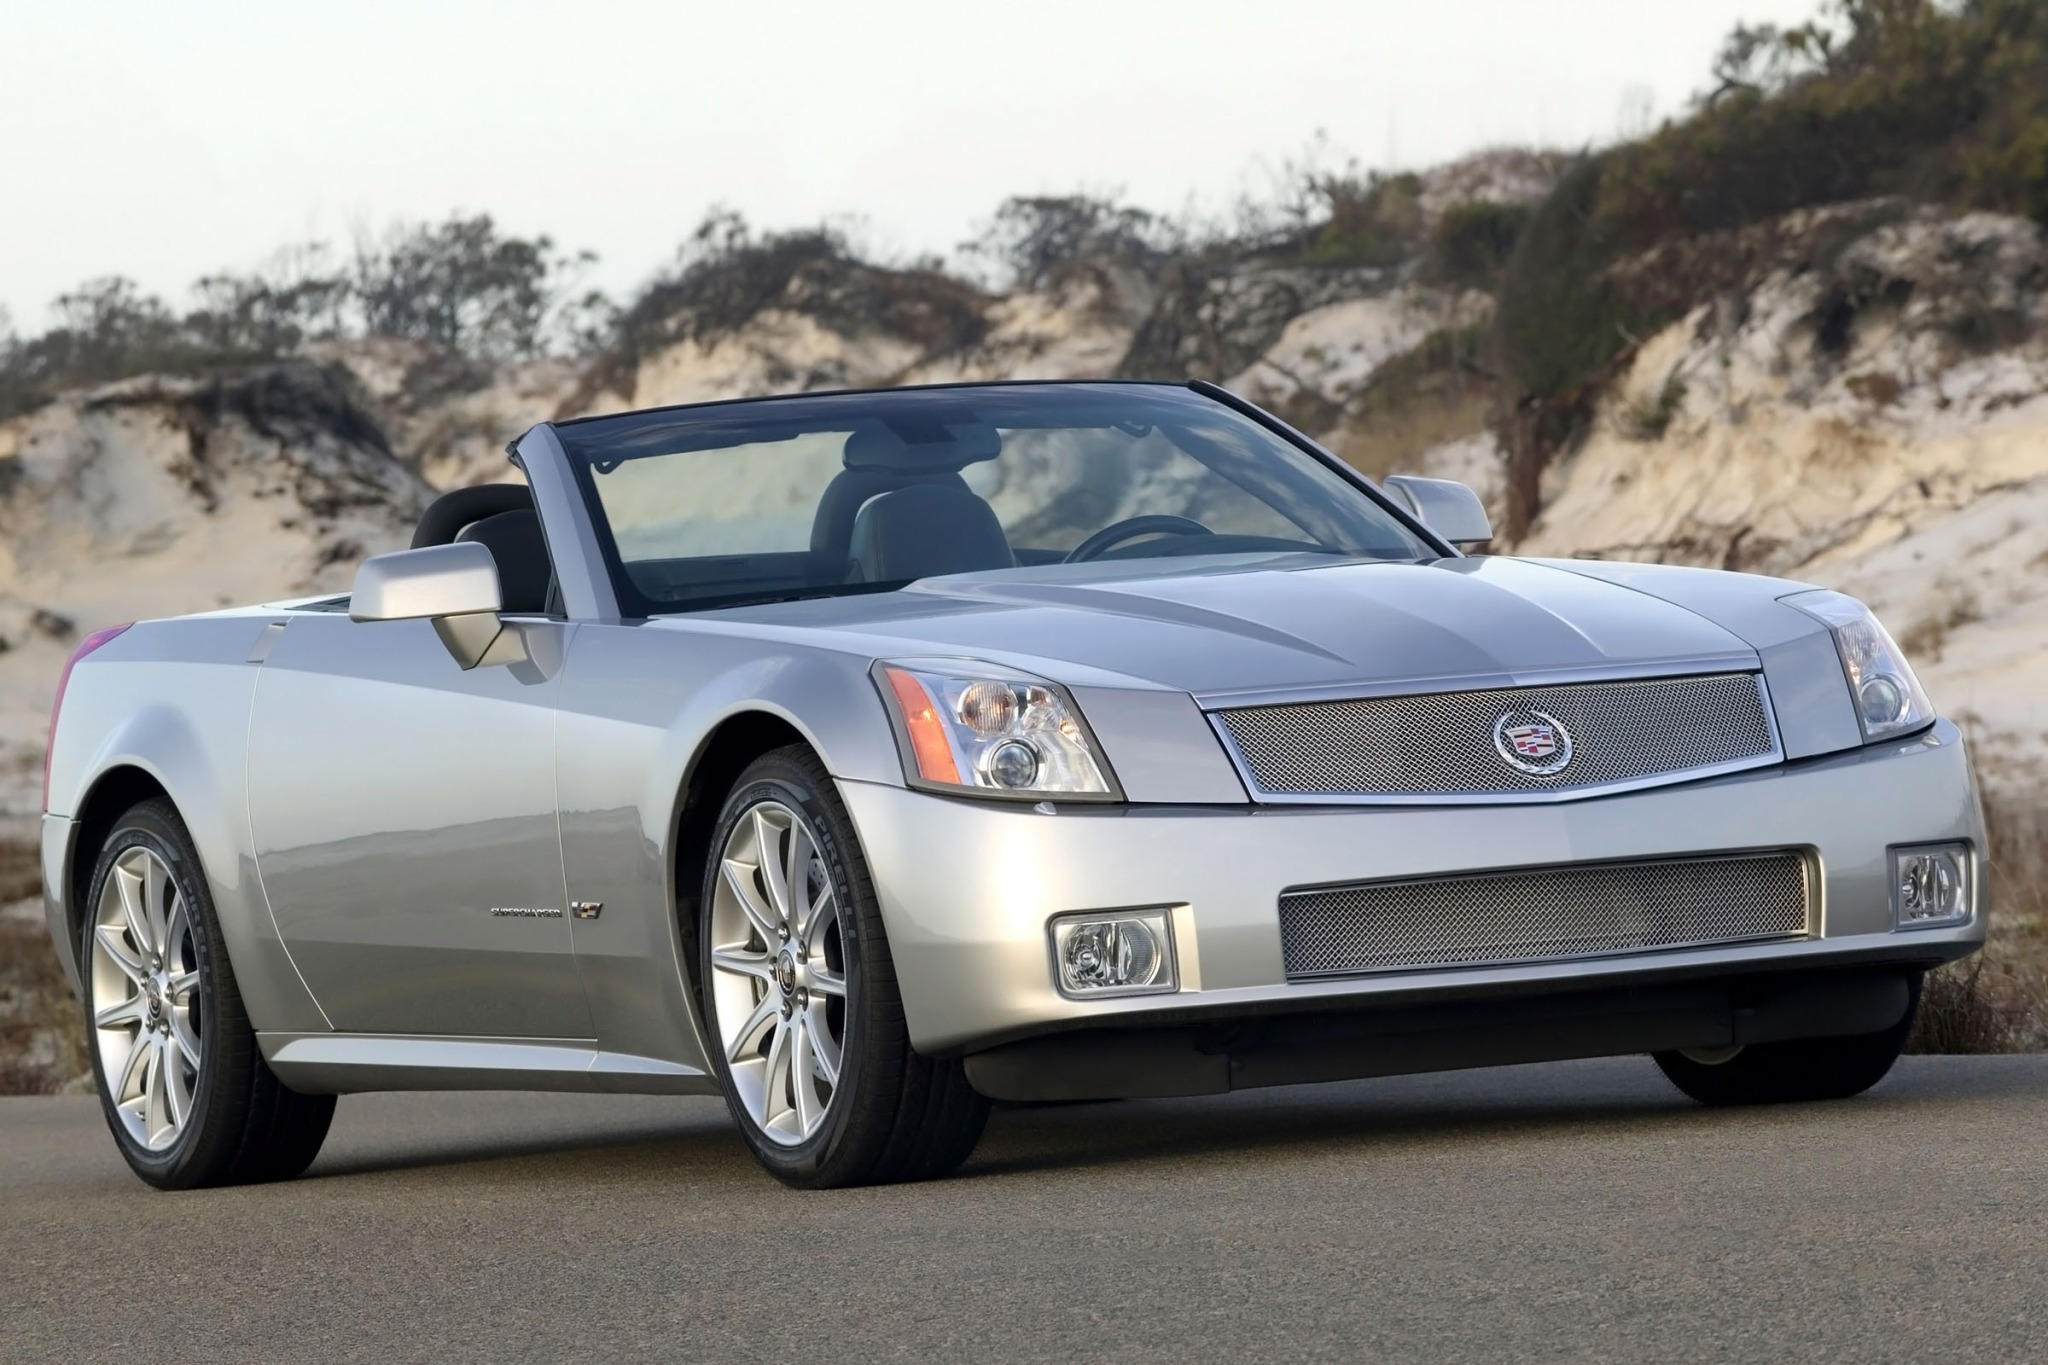 2007 Cadillac XLR-V - Information and photos - ZombieDrive